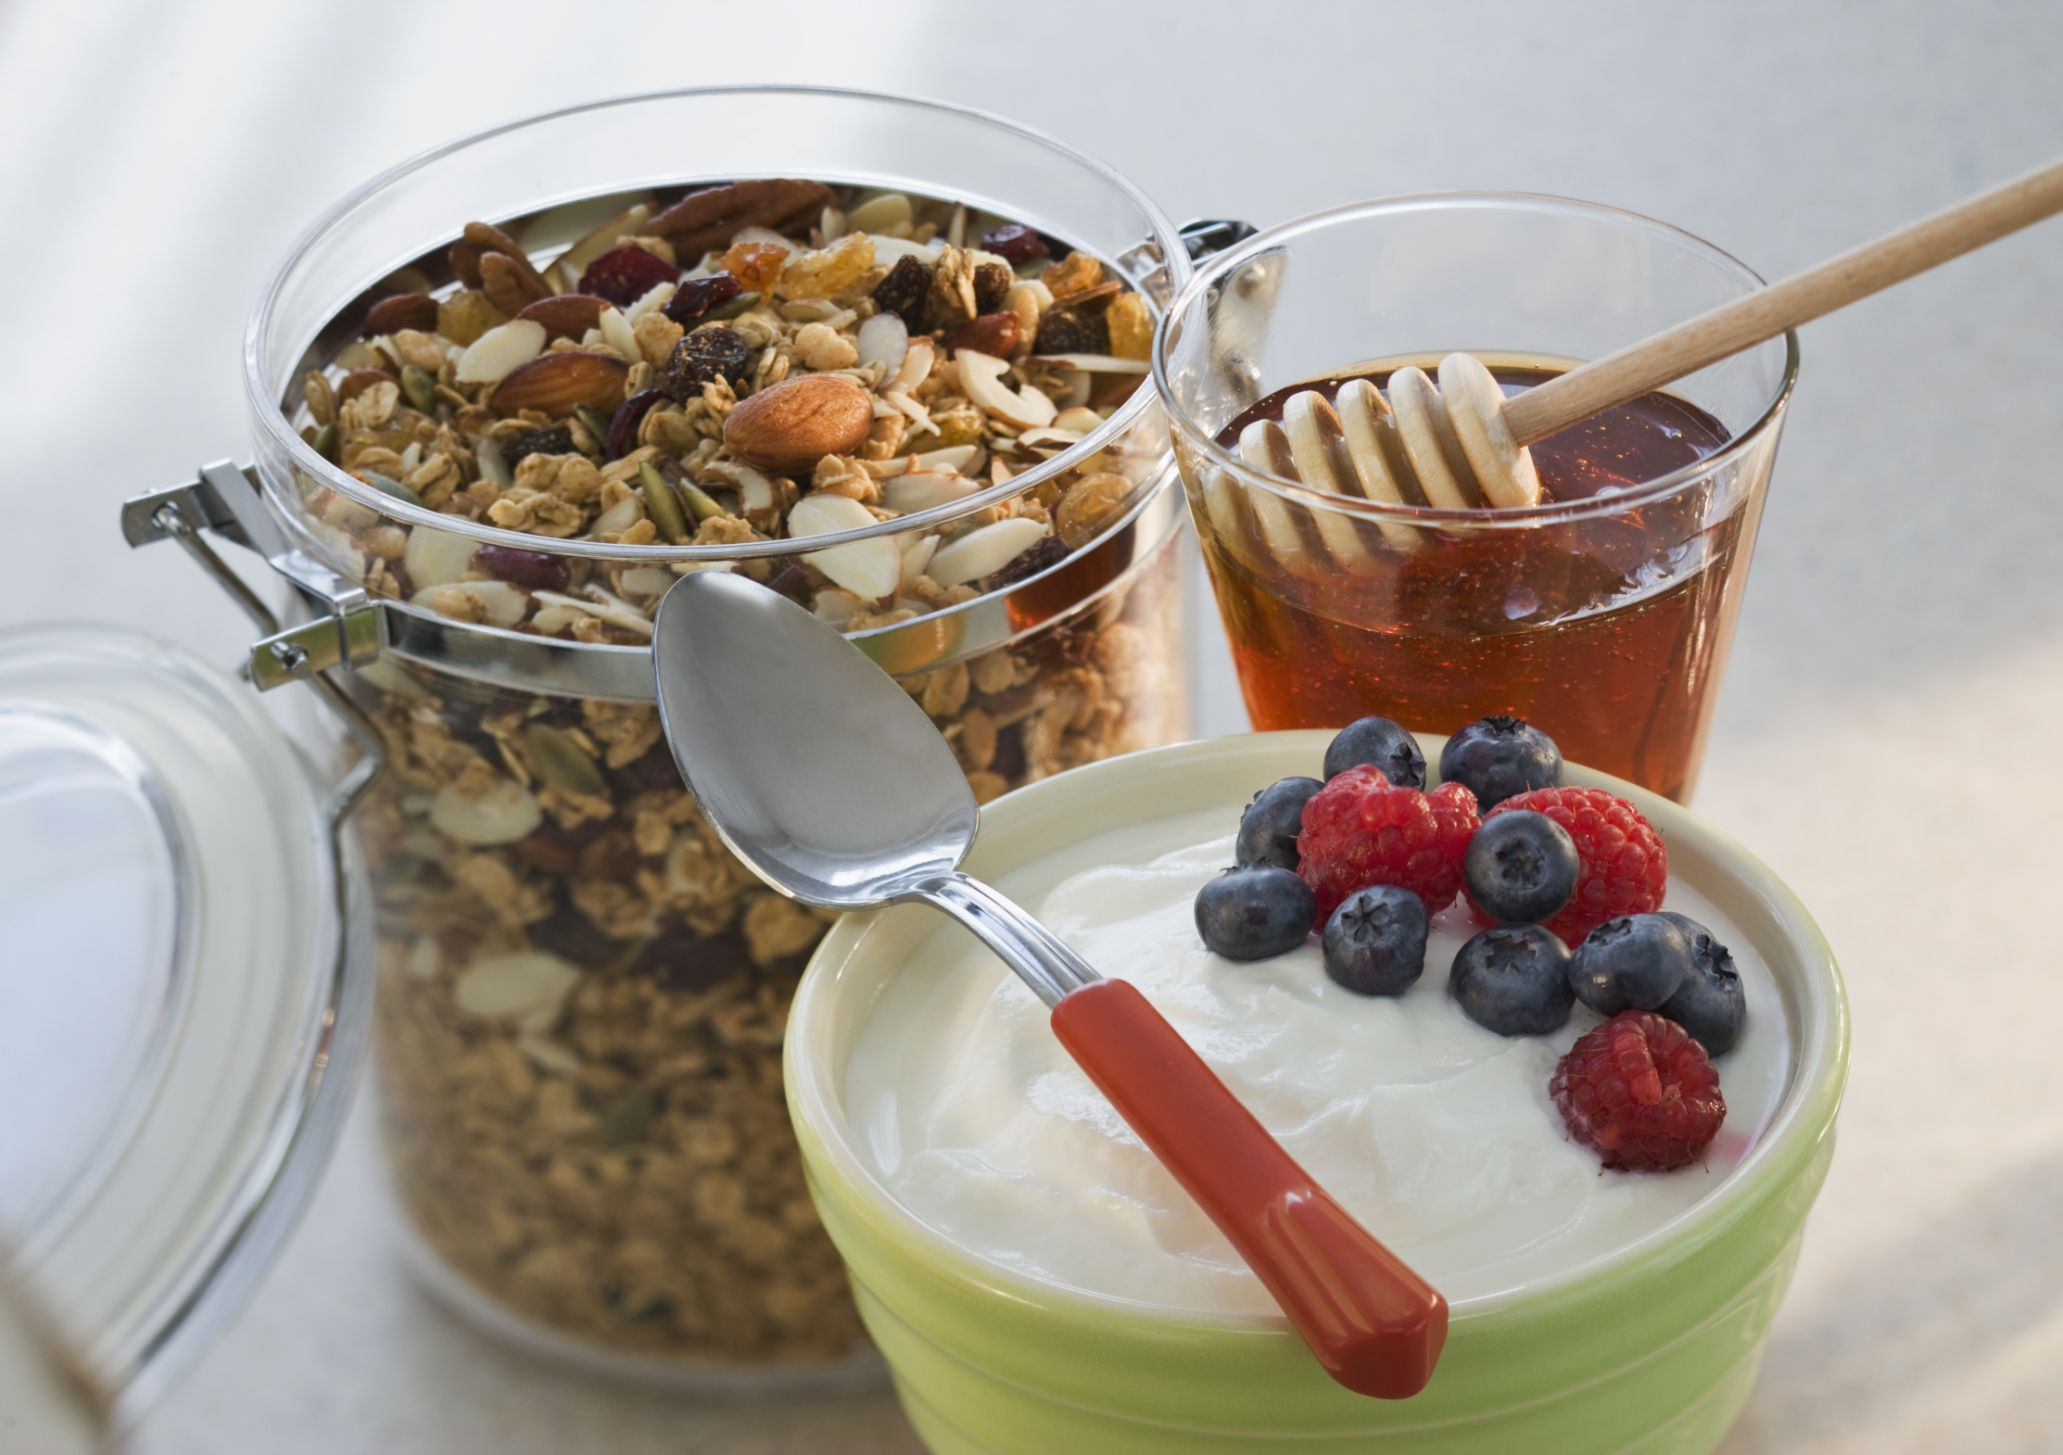 Healthy And Quick Gluten Free Breakfast Ideas